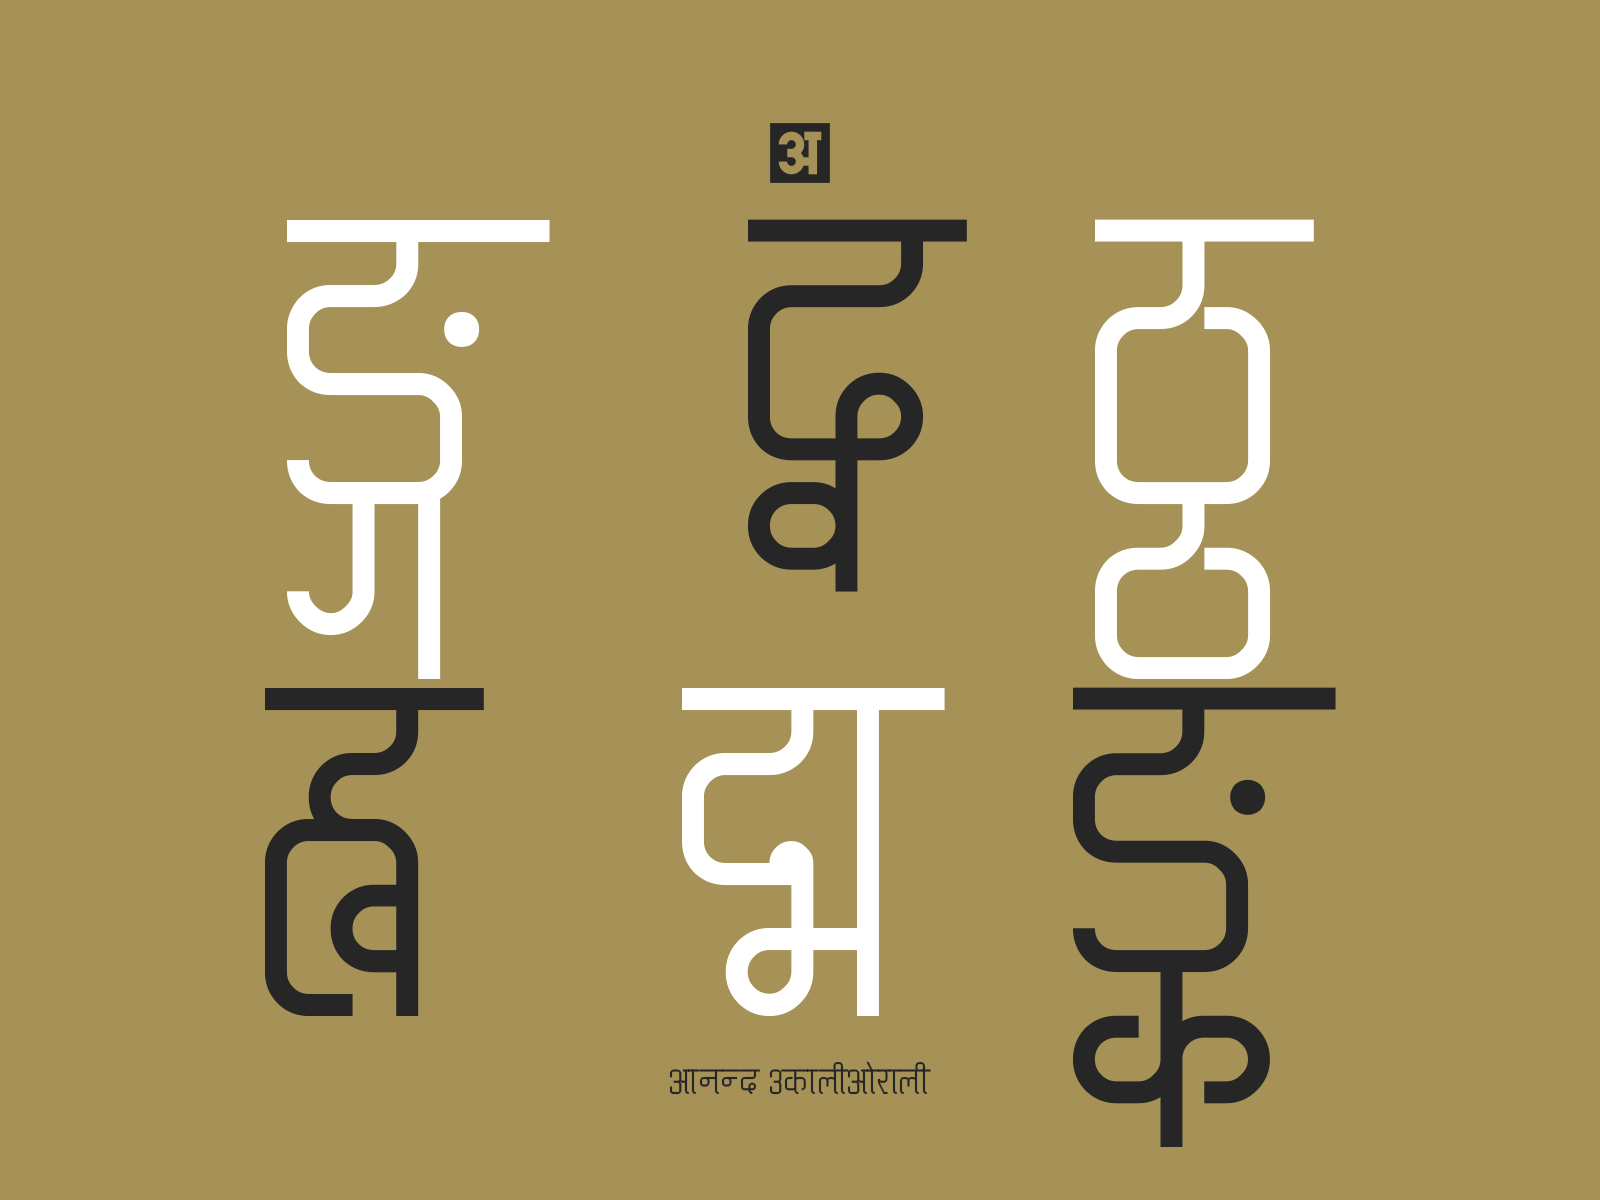 Free Typeface Devanagari font - Ananda ukaliorali on Behance